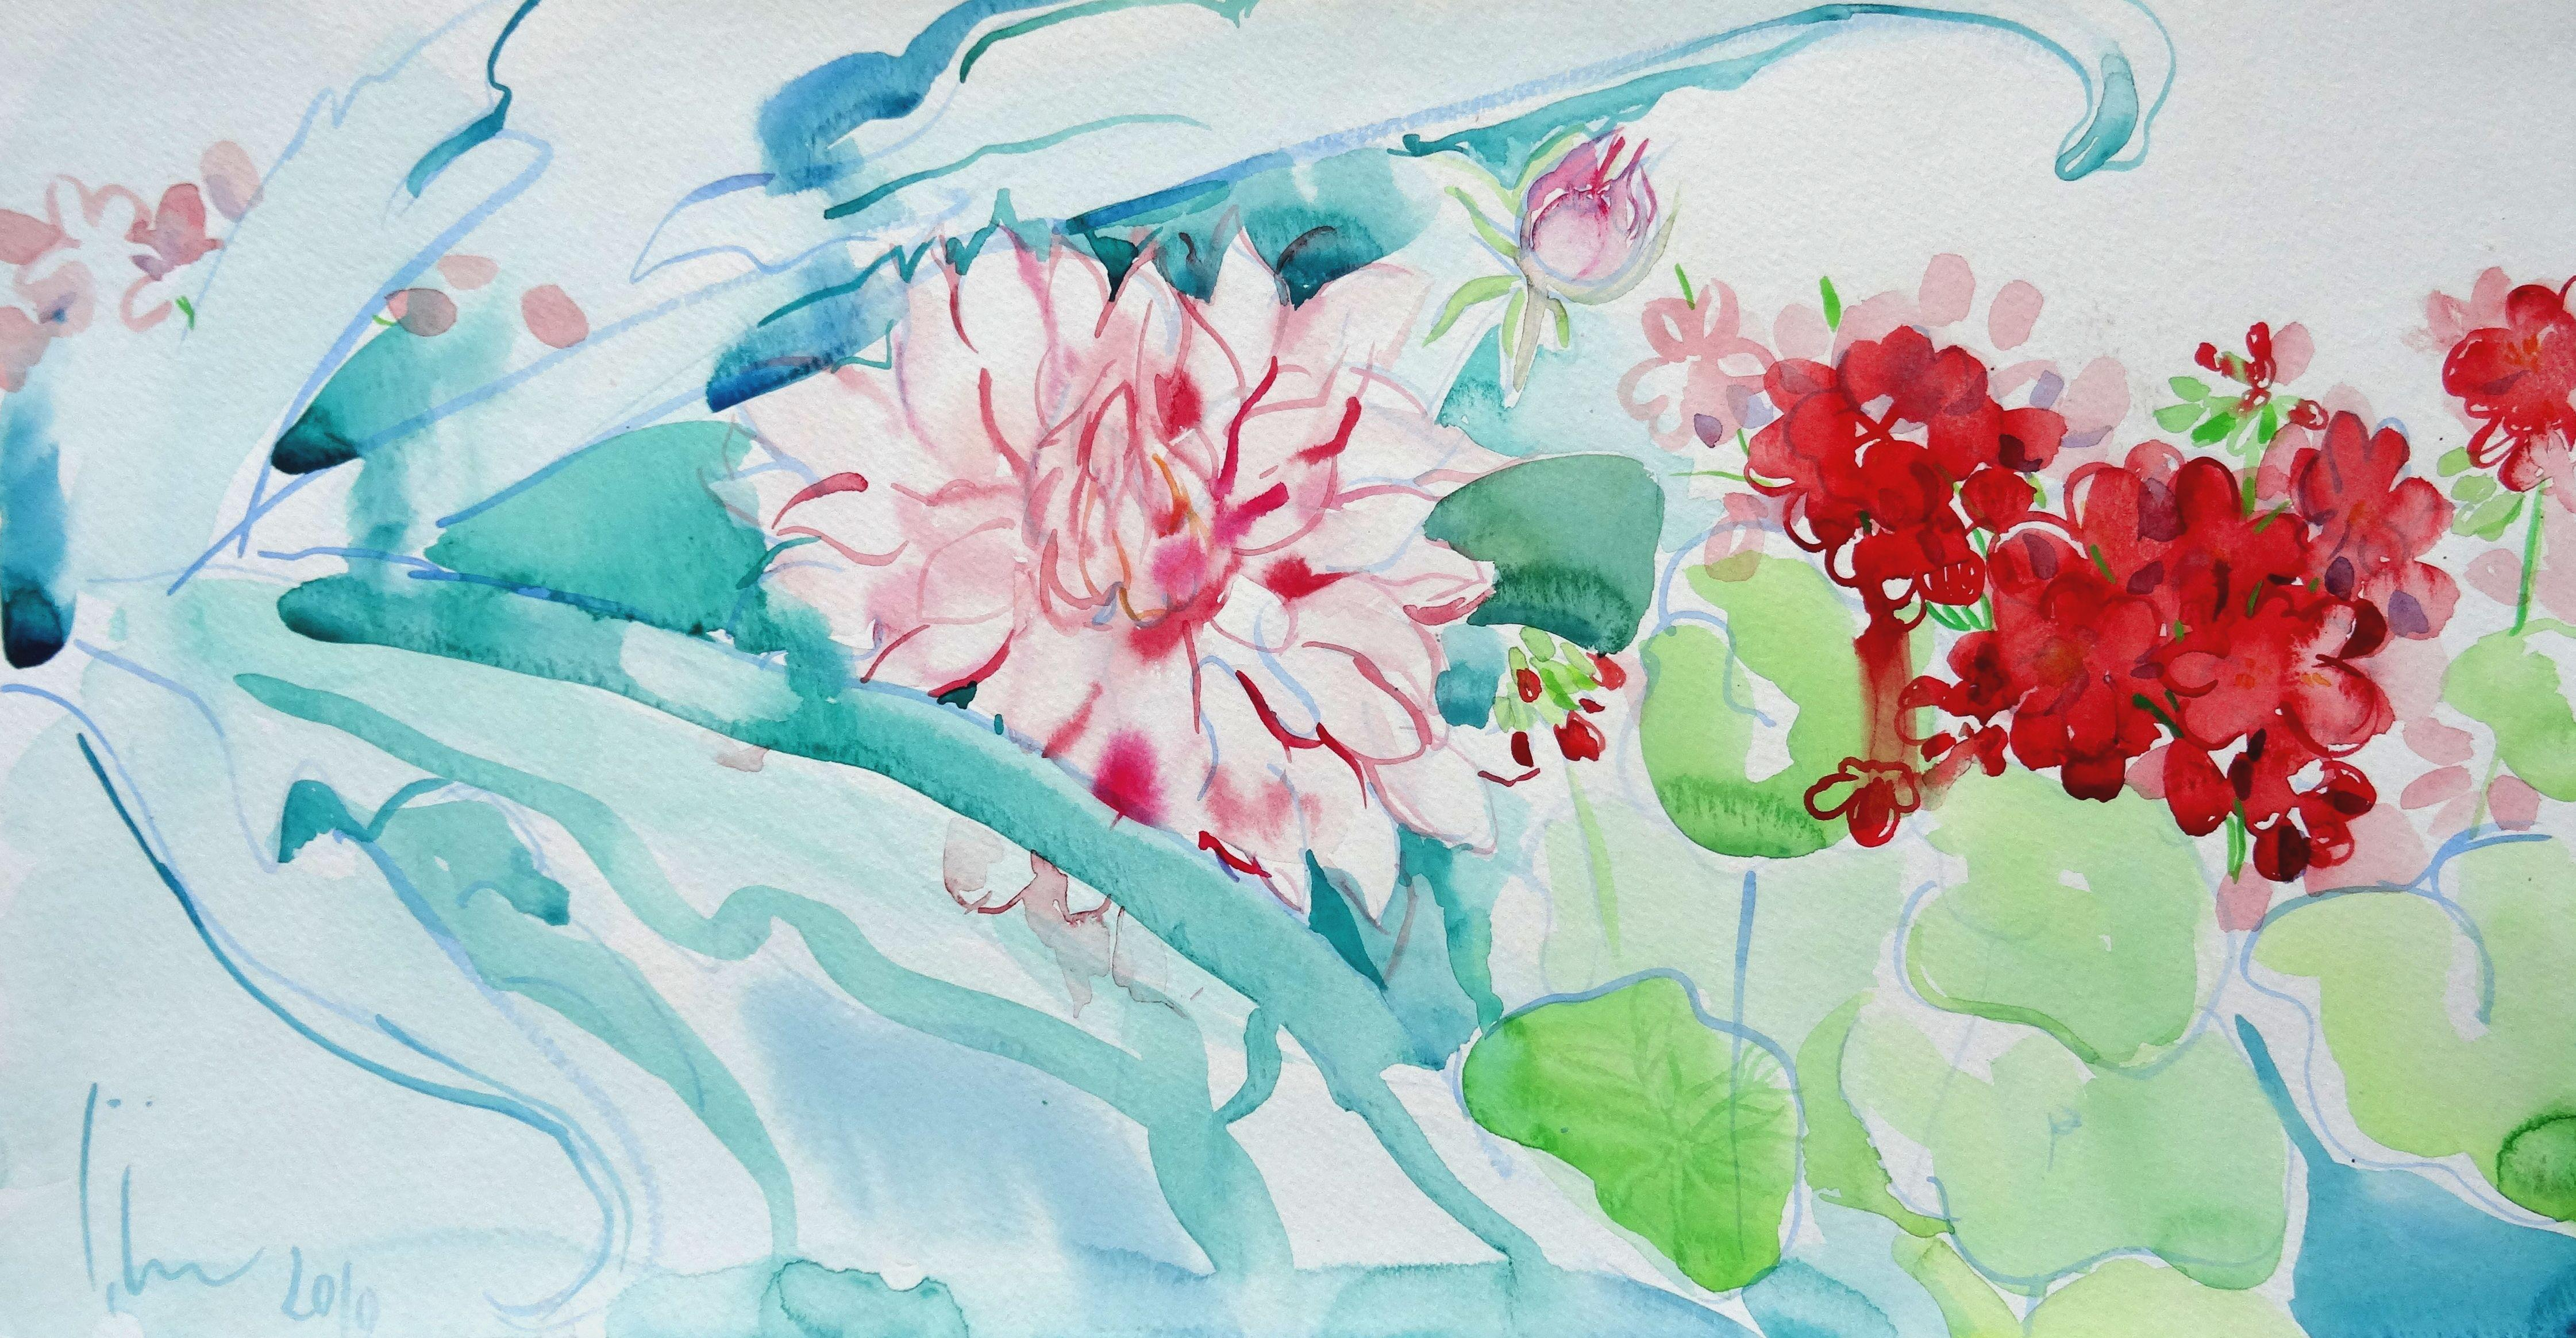 Flowers Luxembourg Garden Paris. 2010. Watercolor on paper, 26x50 cm